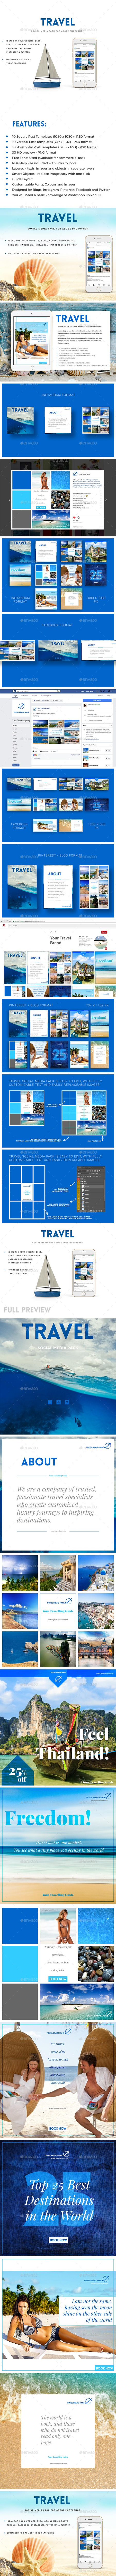 Travel Social Media Pack - Social Media Web Elements